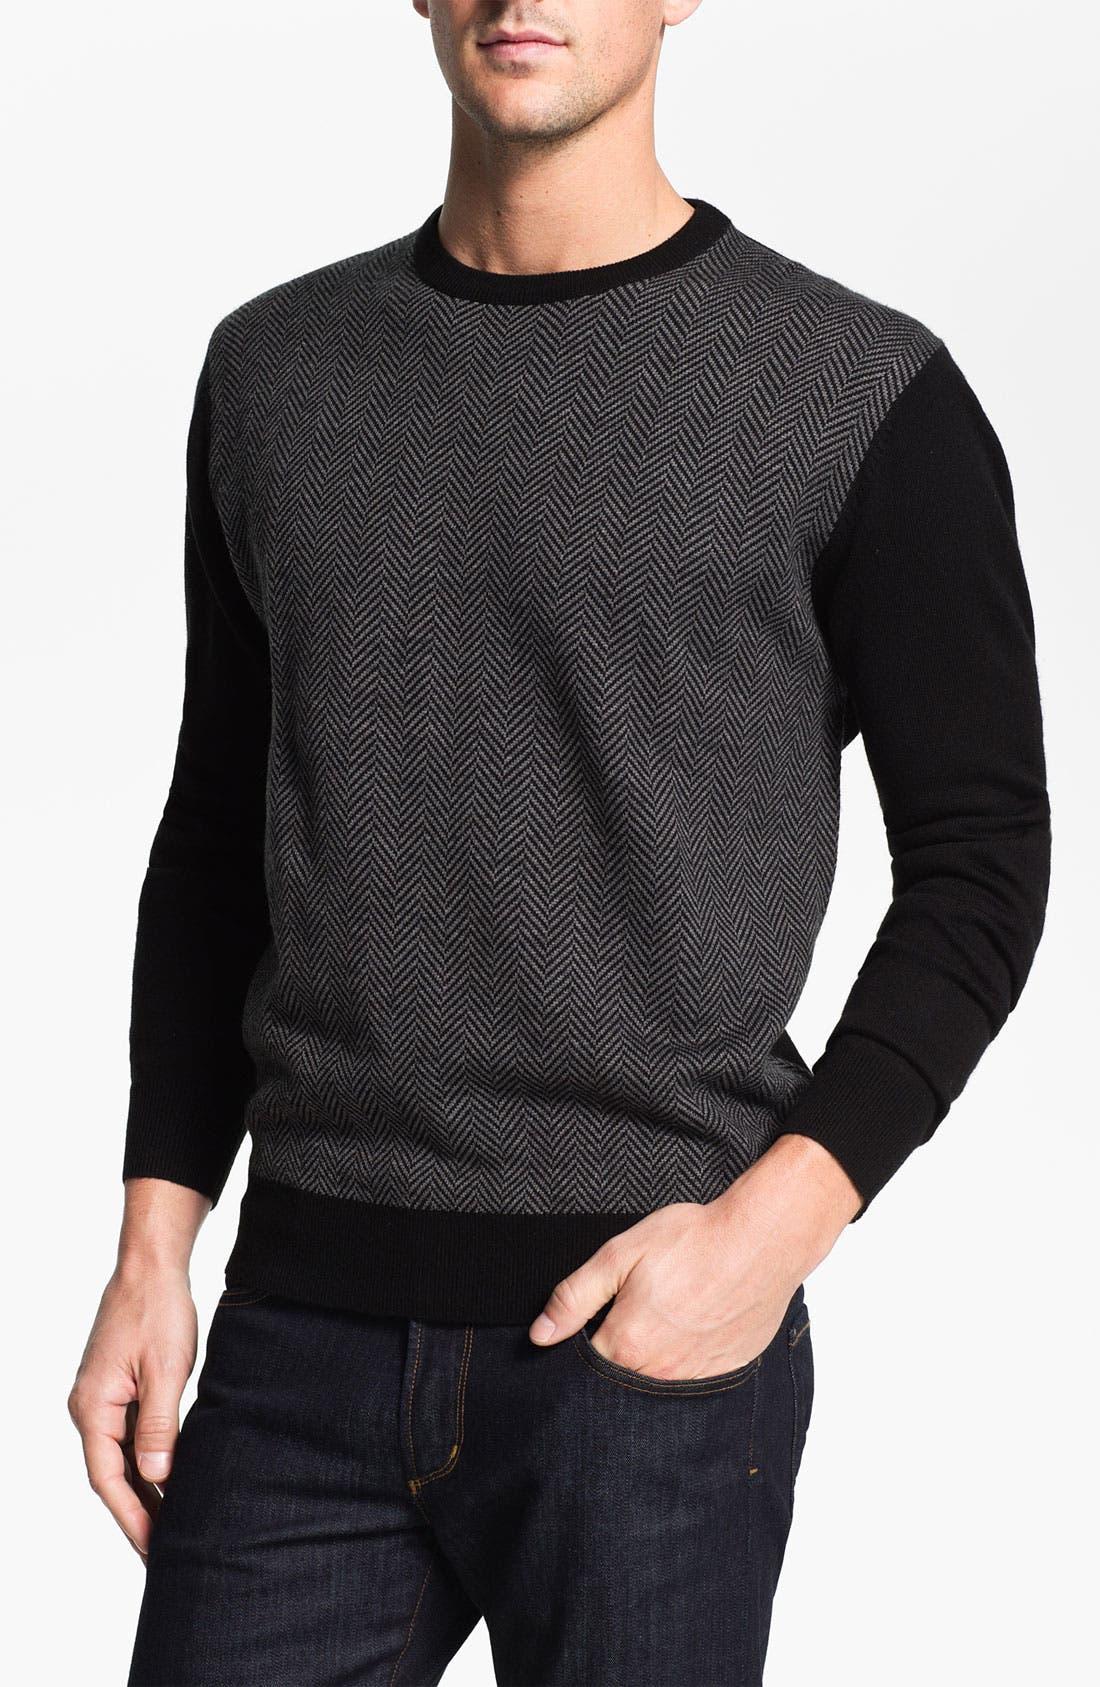 Main Image - Toscano Wool Blend Crewneck Sweater